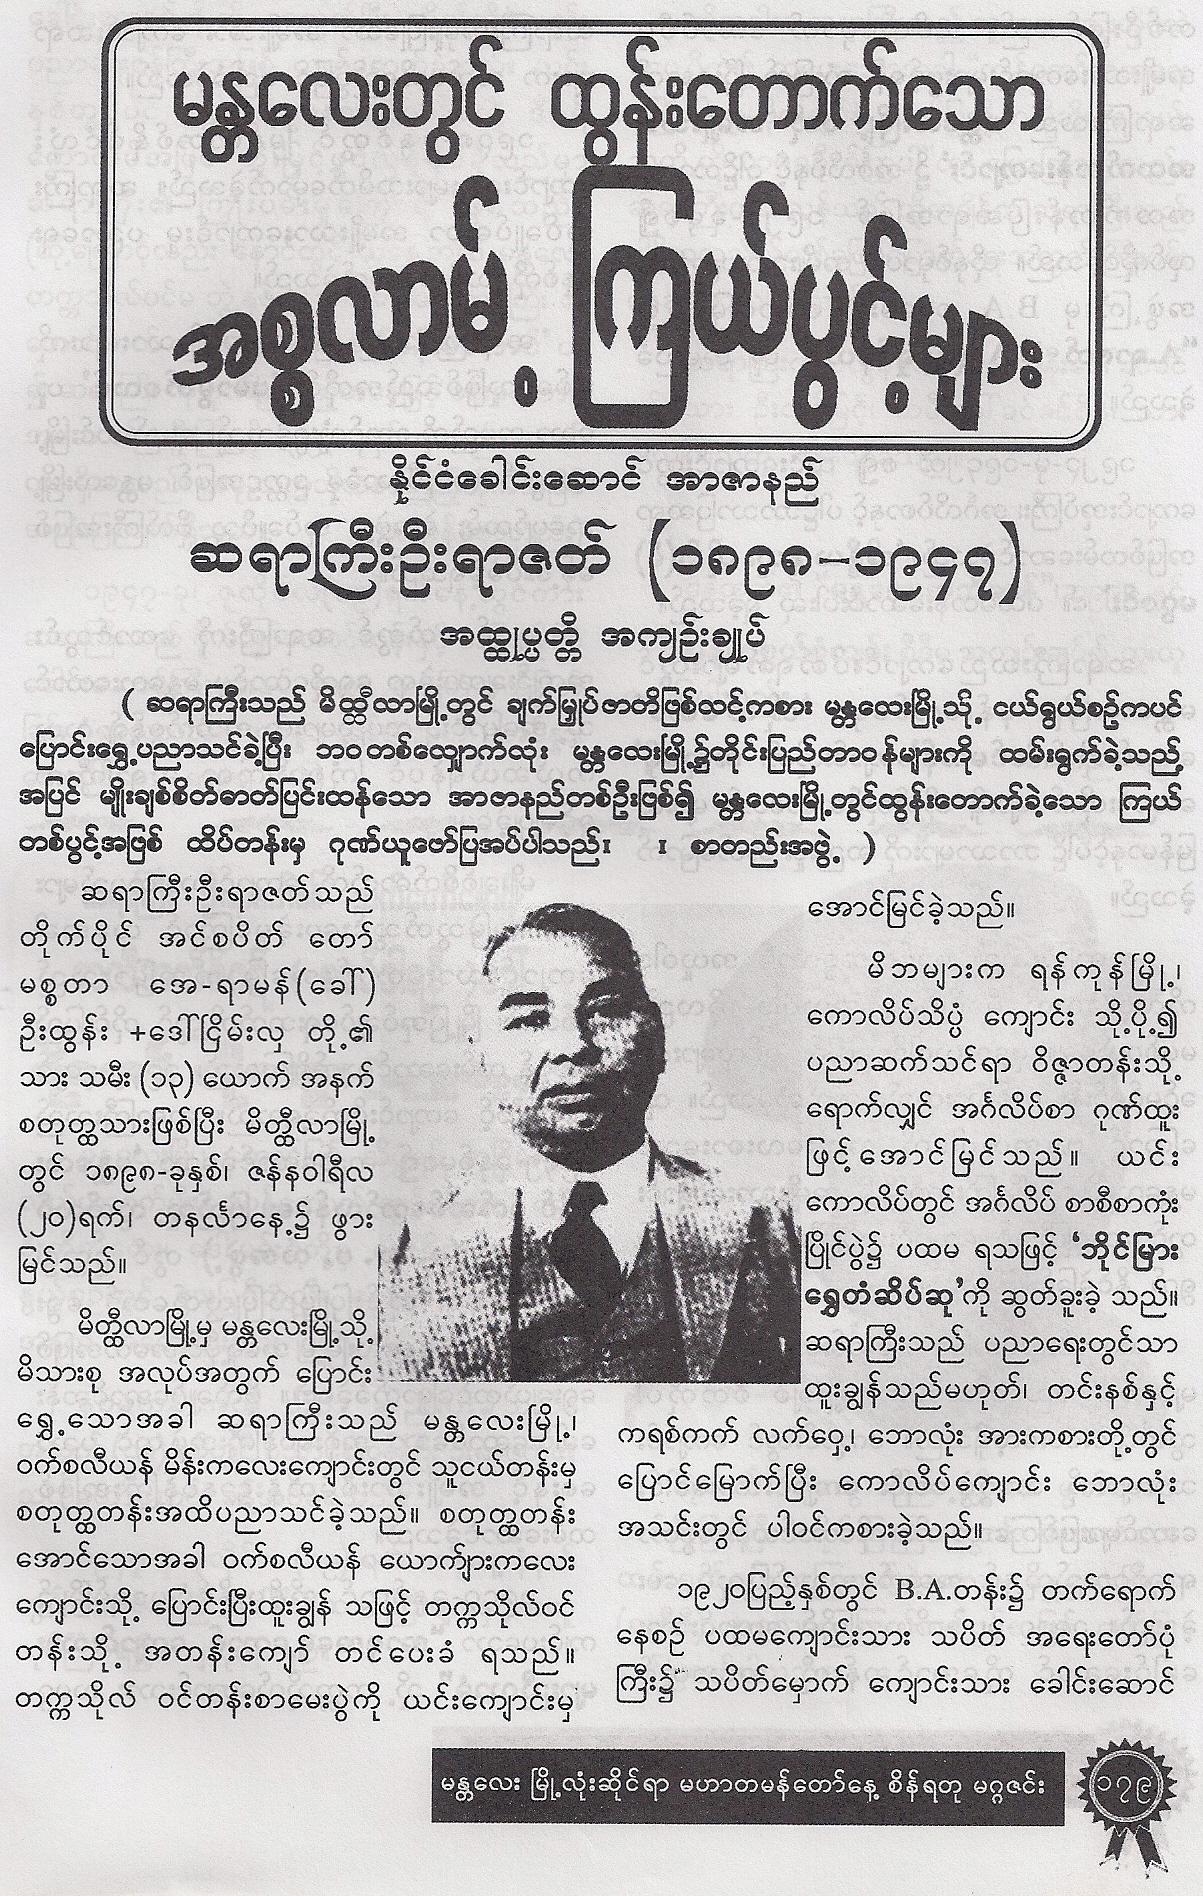 größte stadt myanmar